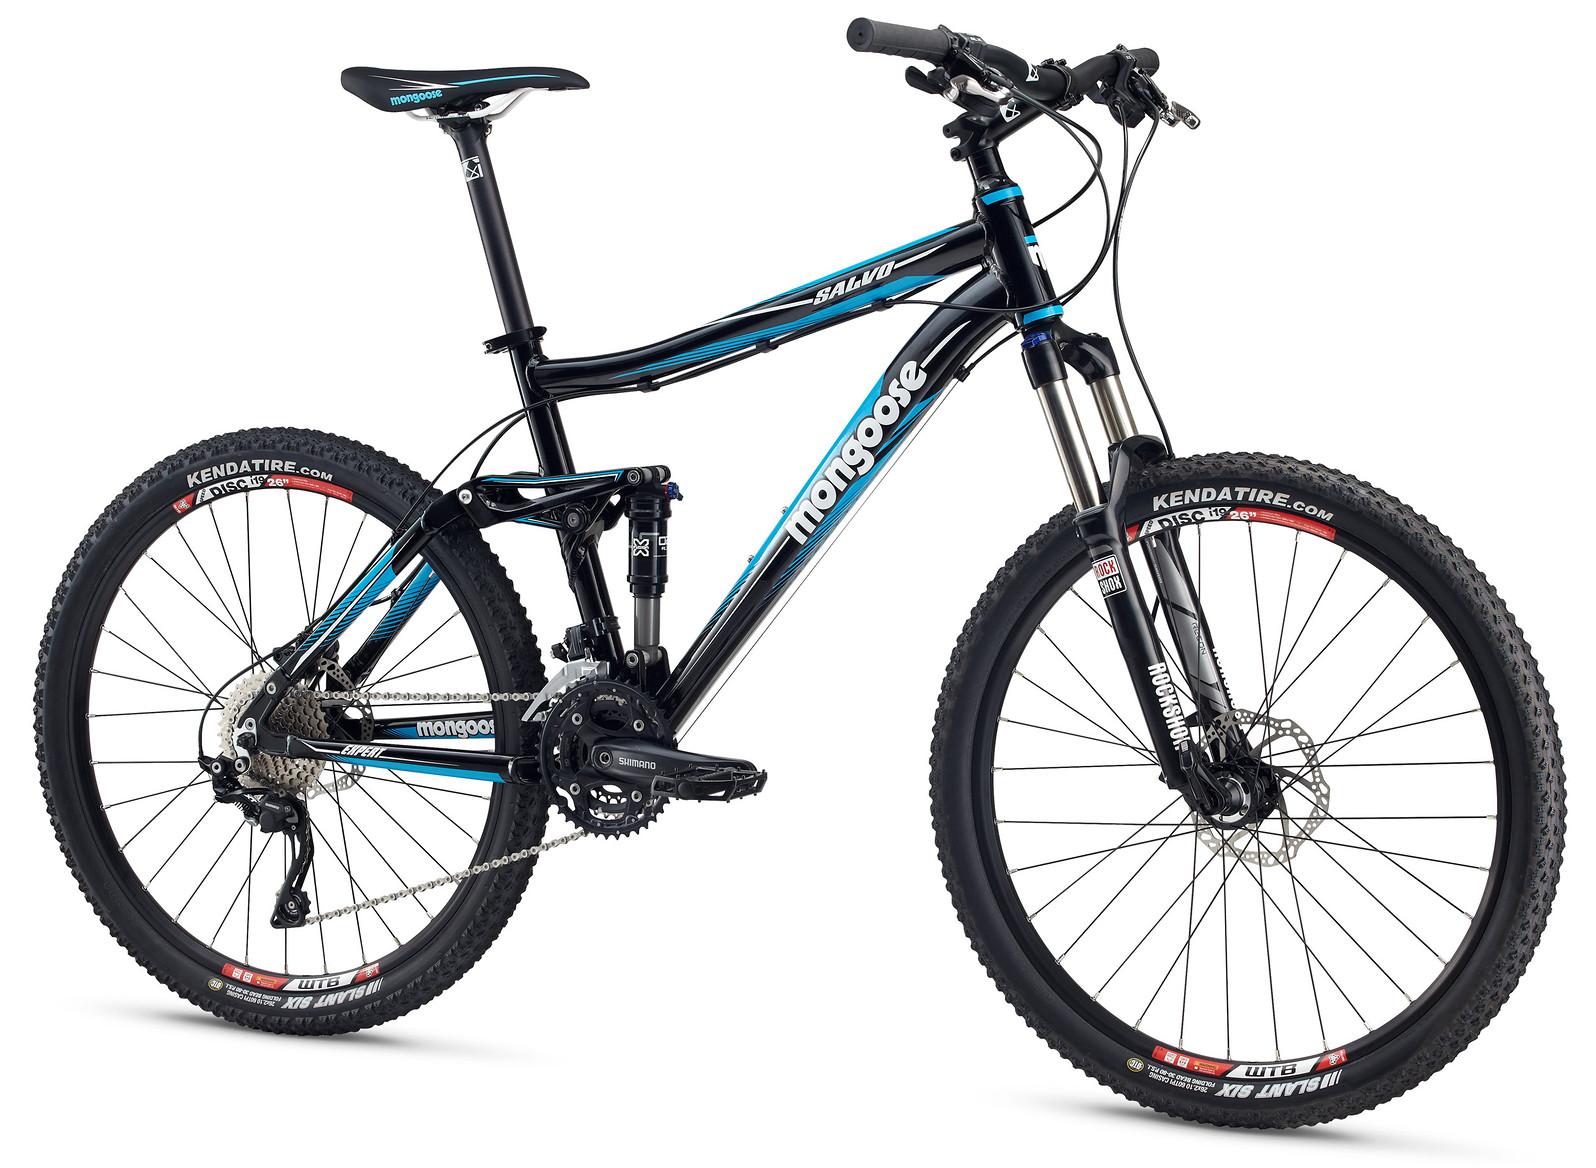 2014 Mongoose Salvo Expert Bike